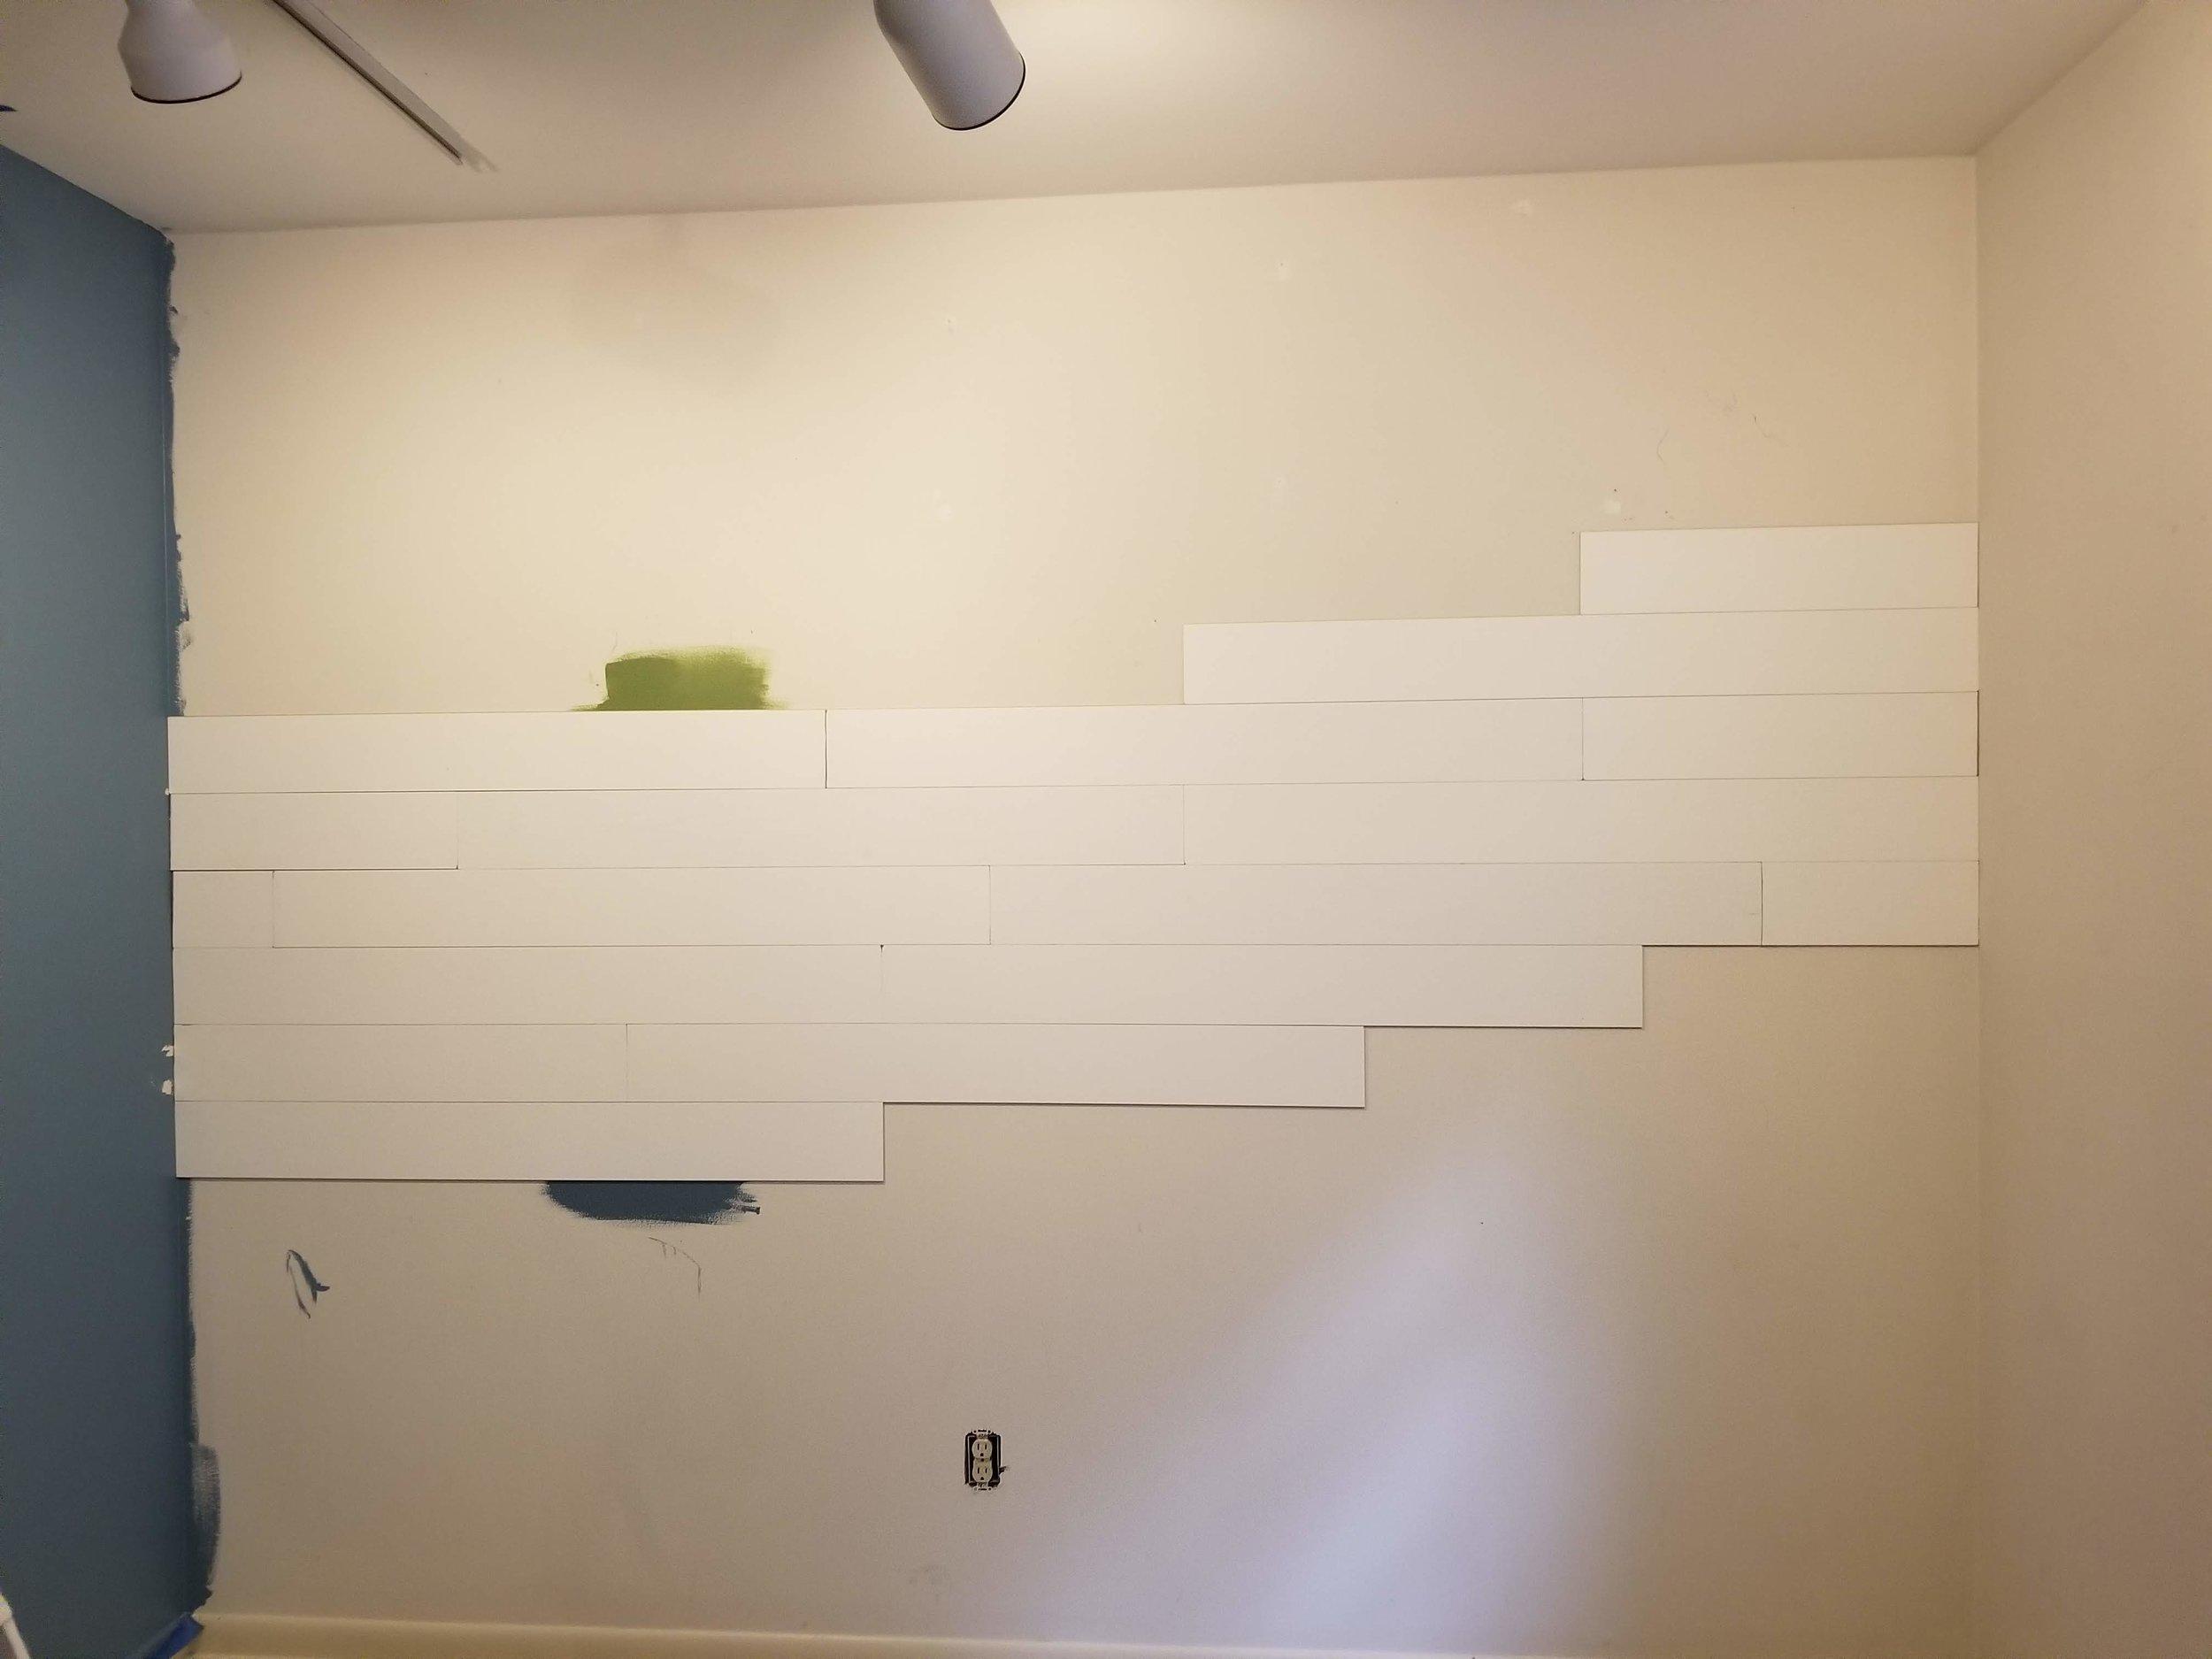 Wallplanks, white shiplap wood wall. Peel and stick wall